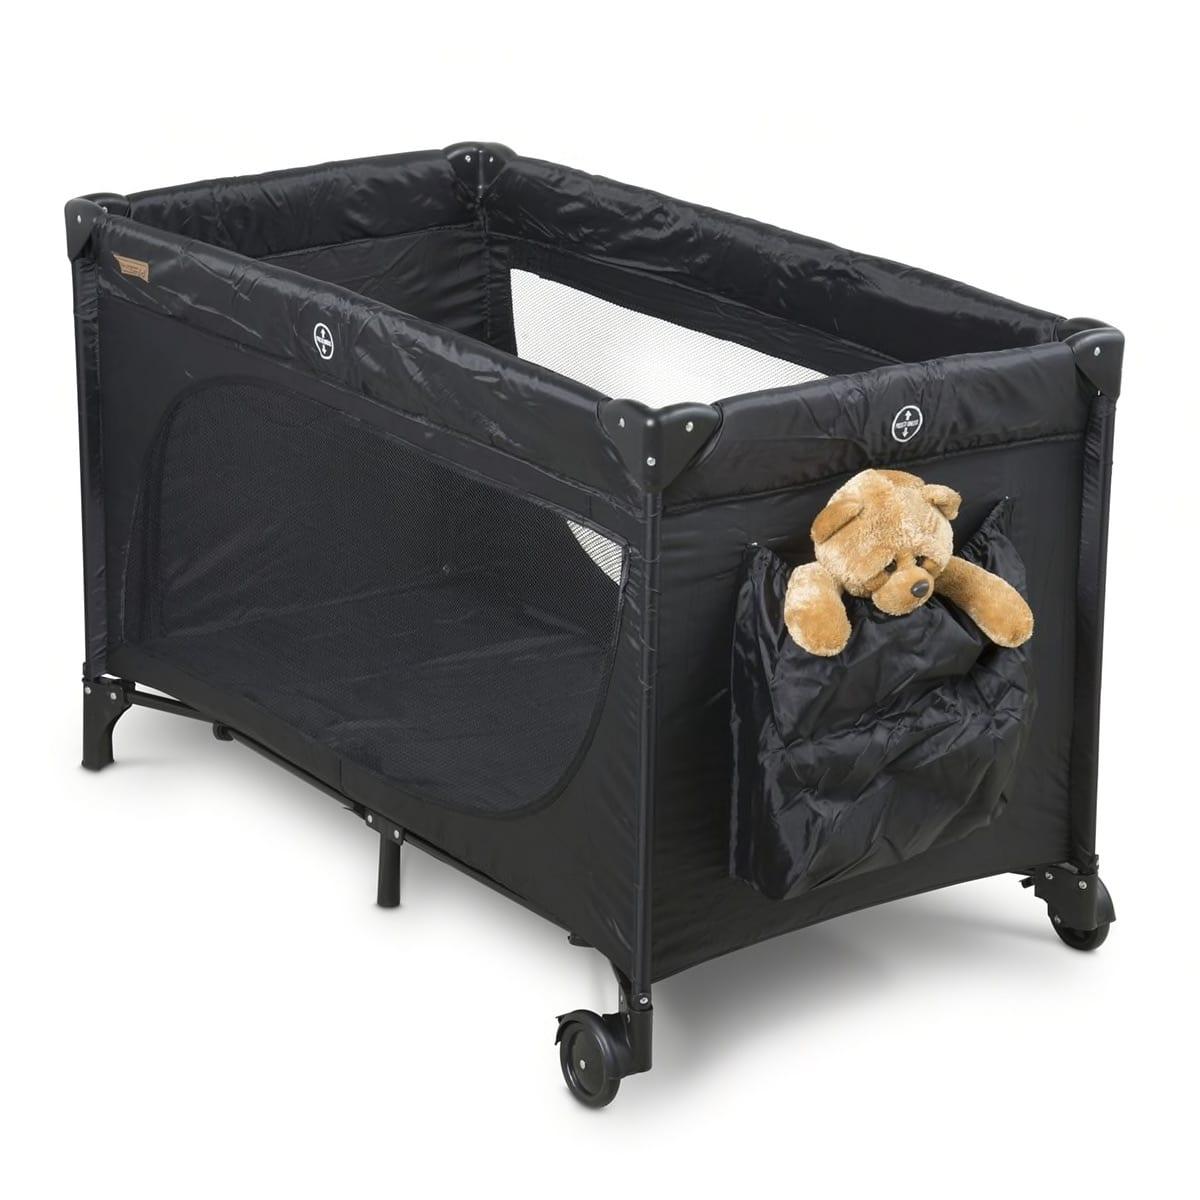 babytrold-weekendseng-med-opbevaringstaske-sort.jpg?id=6511475